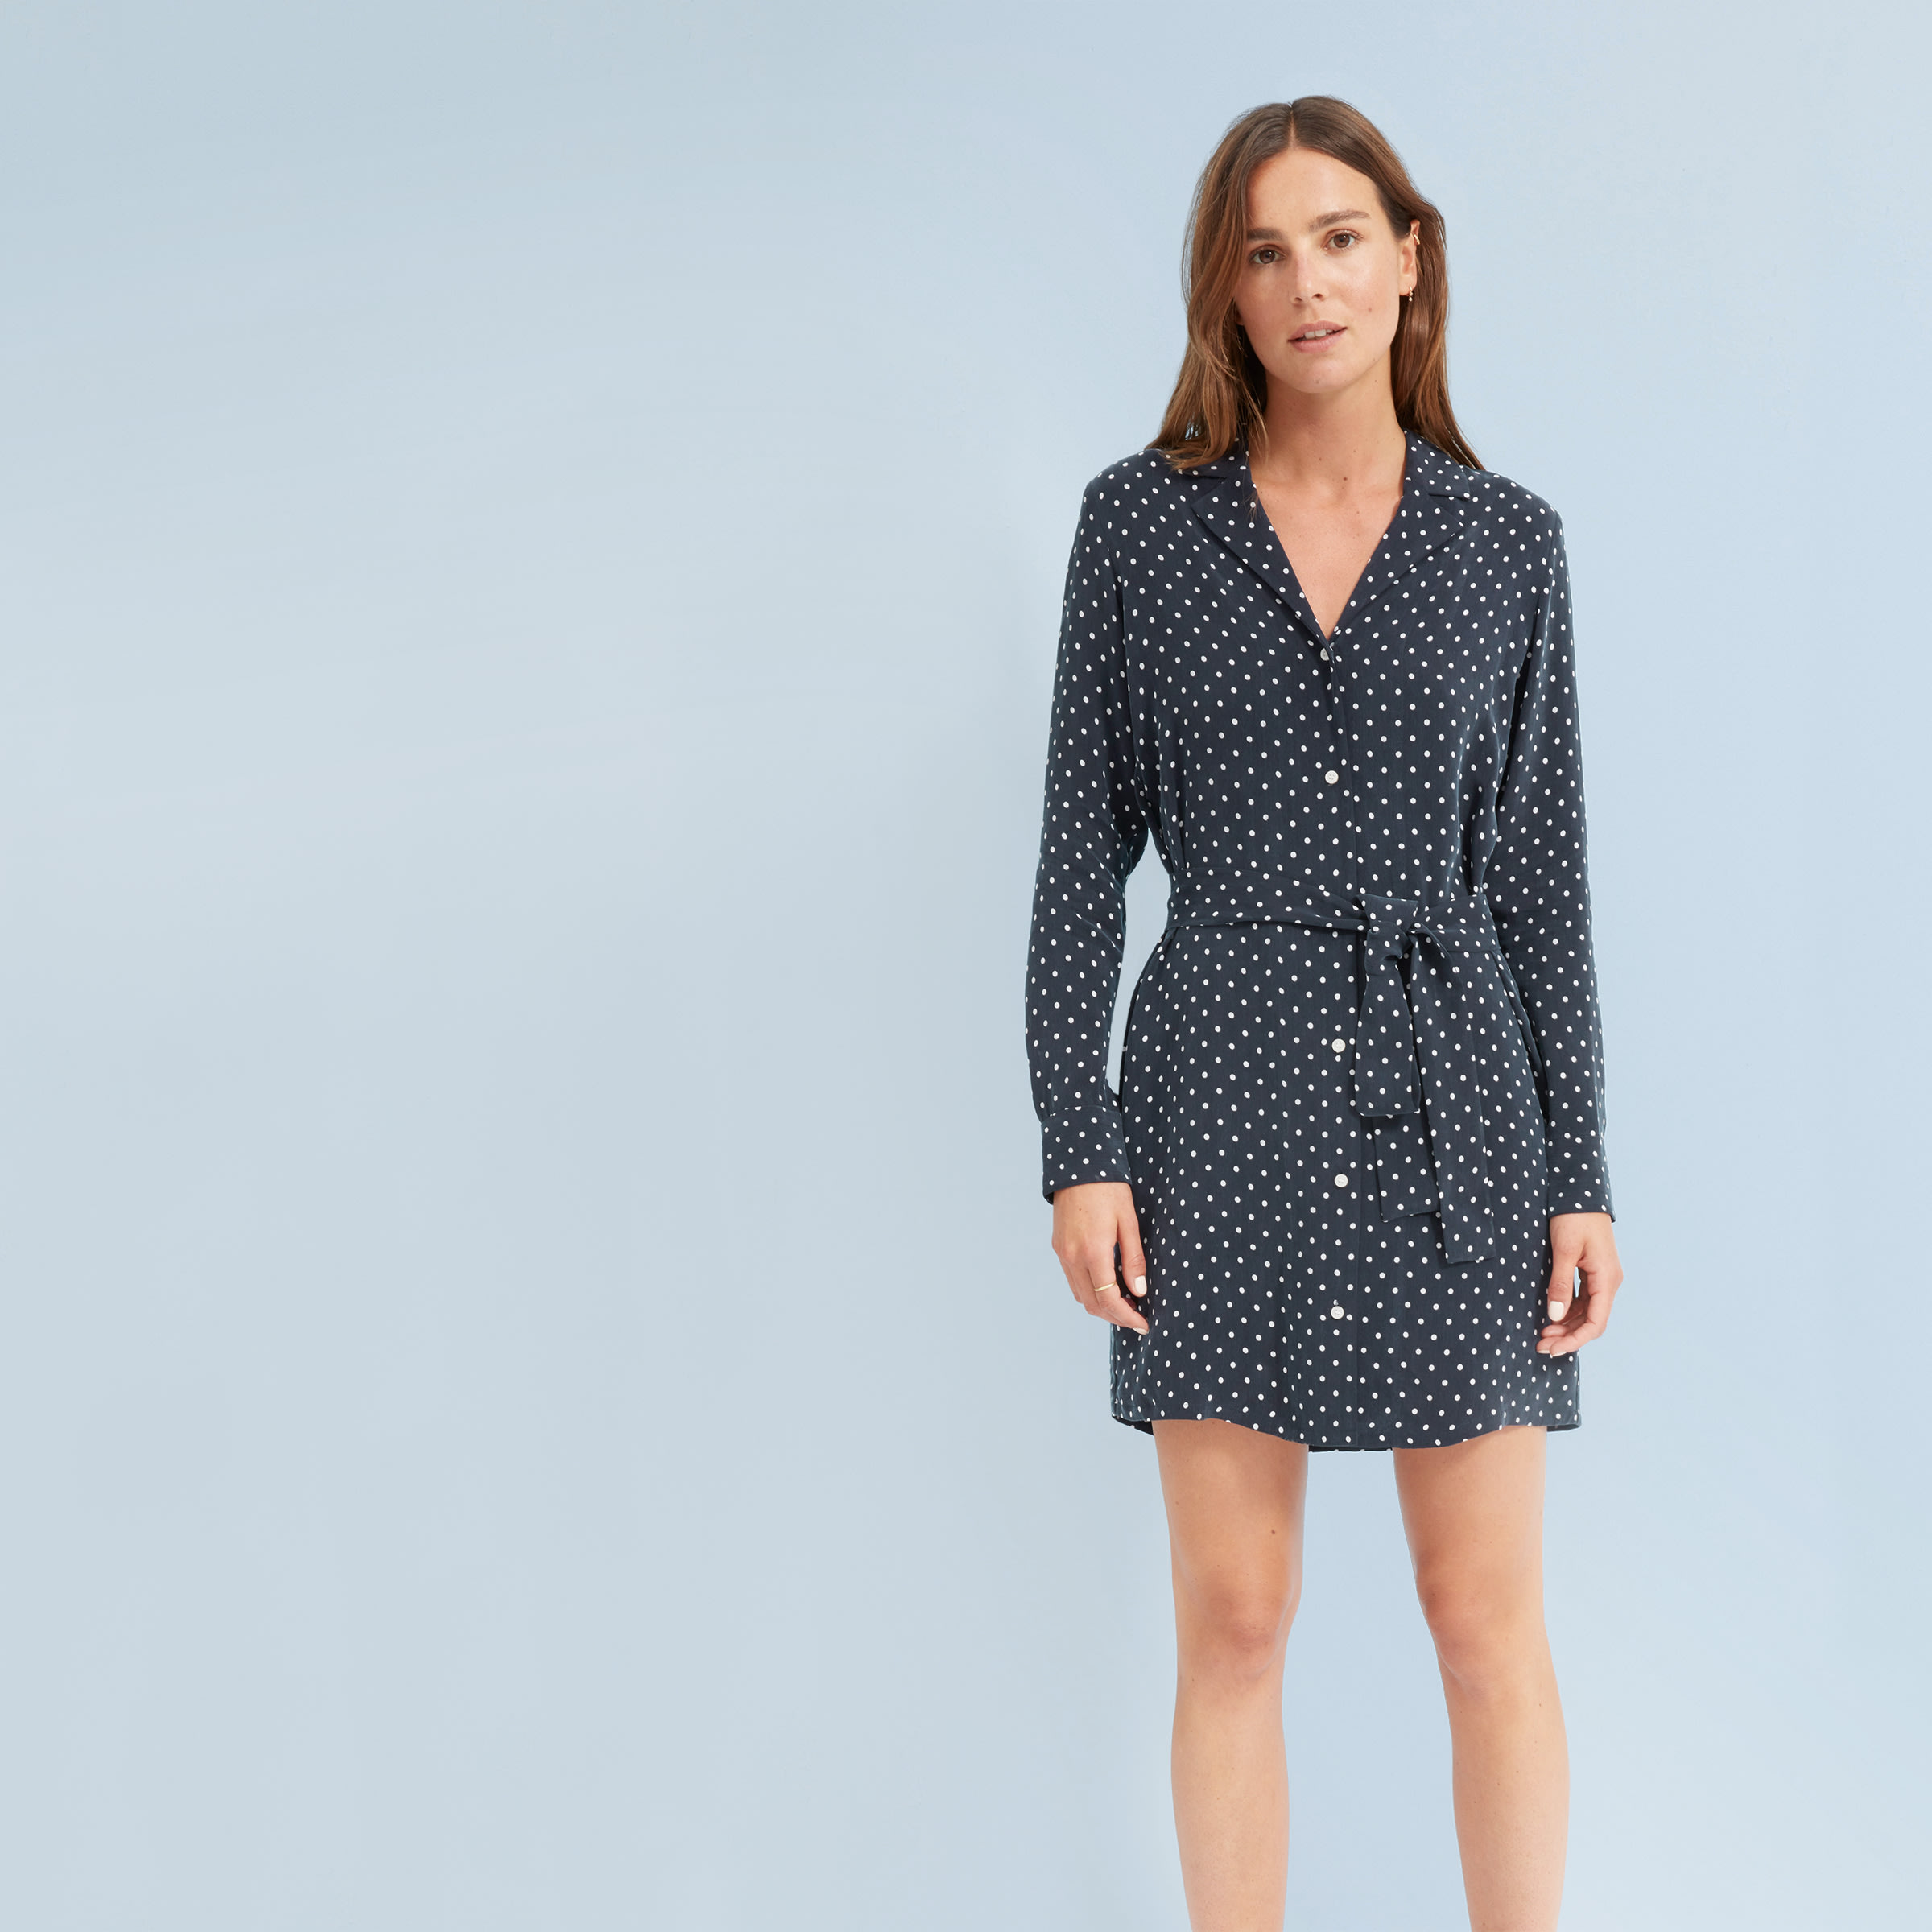 f8288772c958f The Polka Dot Shirt Dress –  110